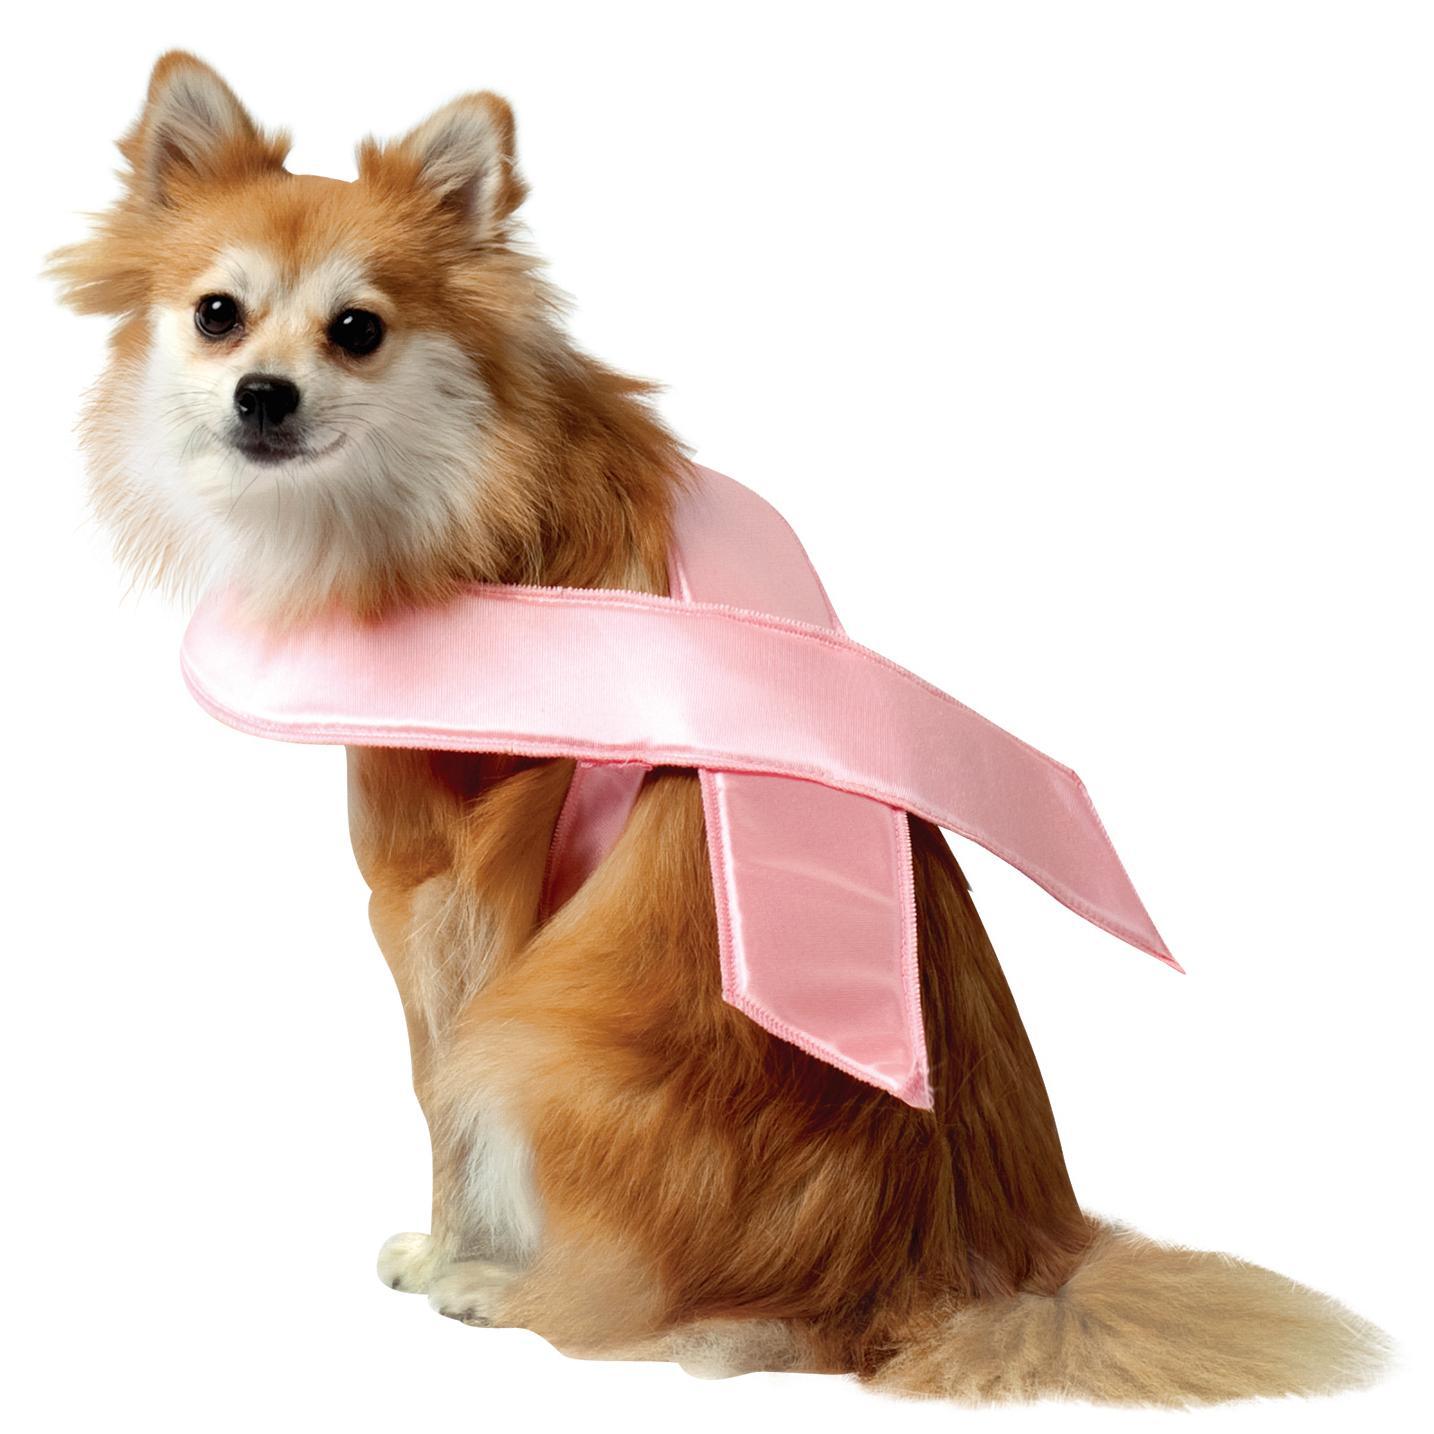 Pink Ribbon Dog Costume by Rasta Imposta